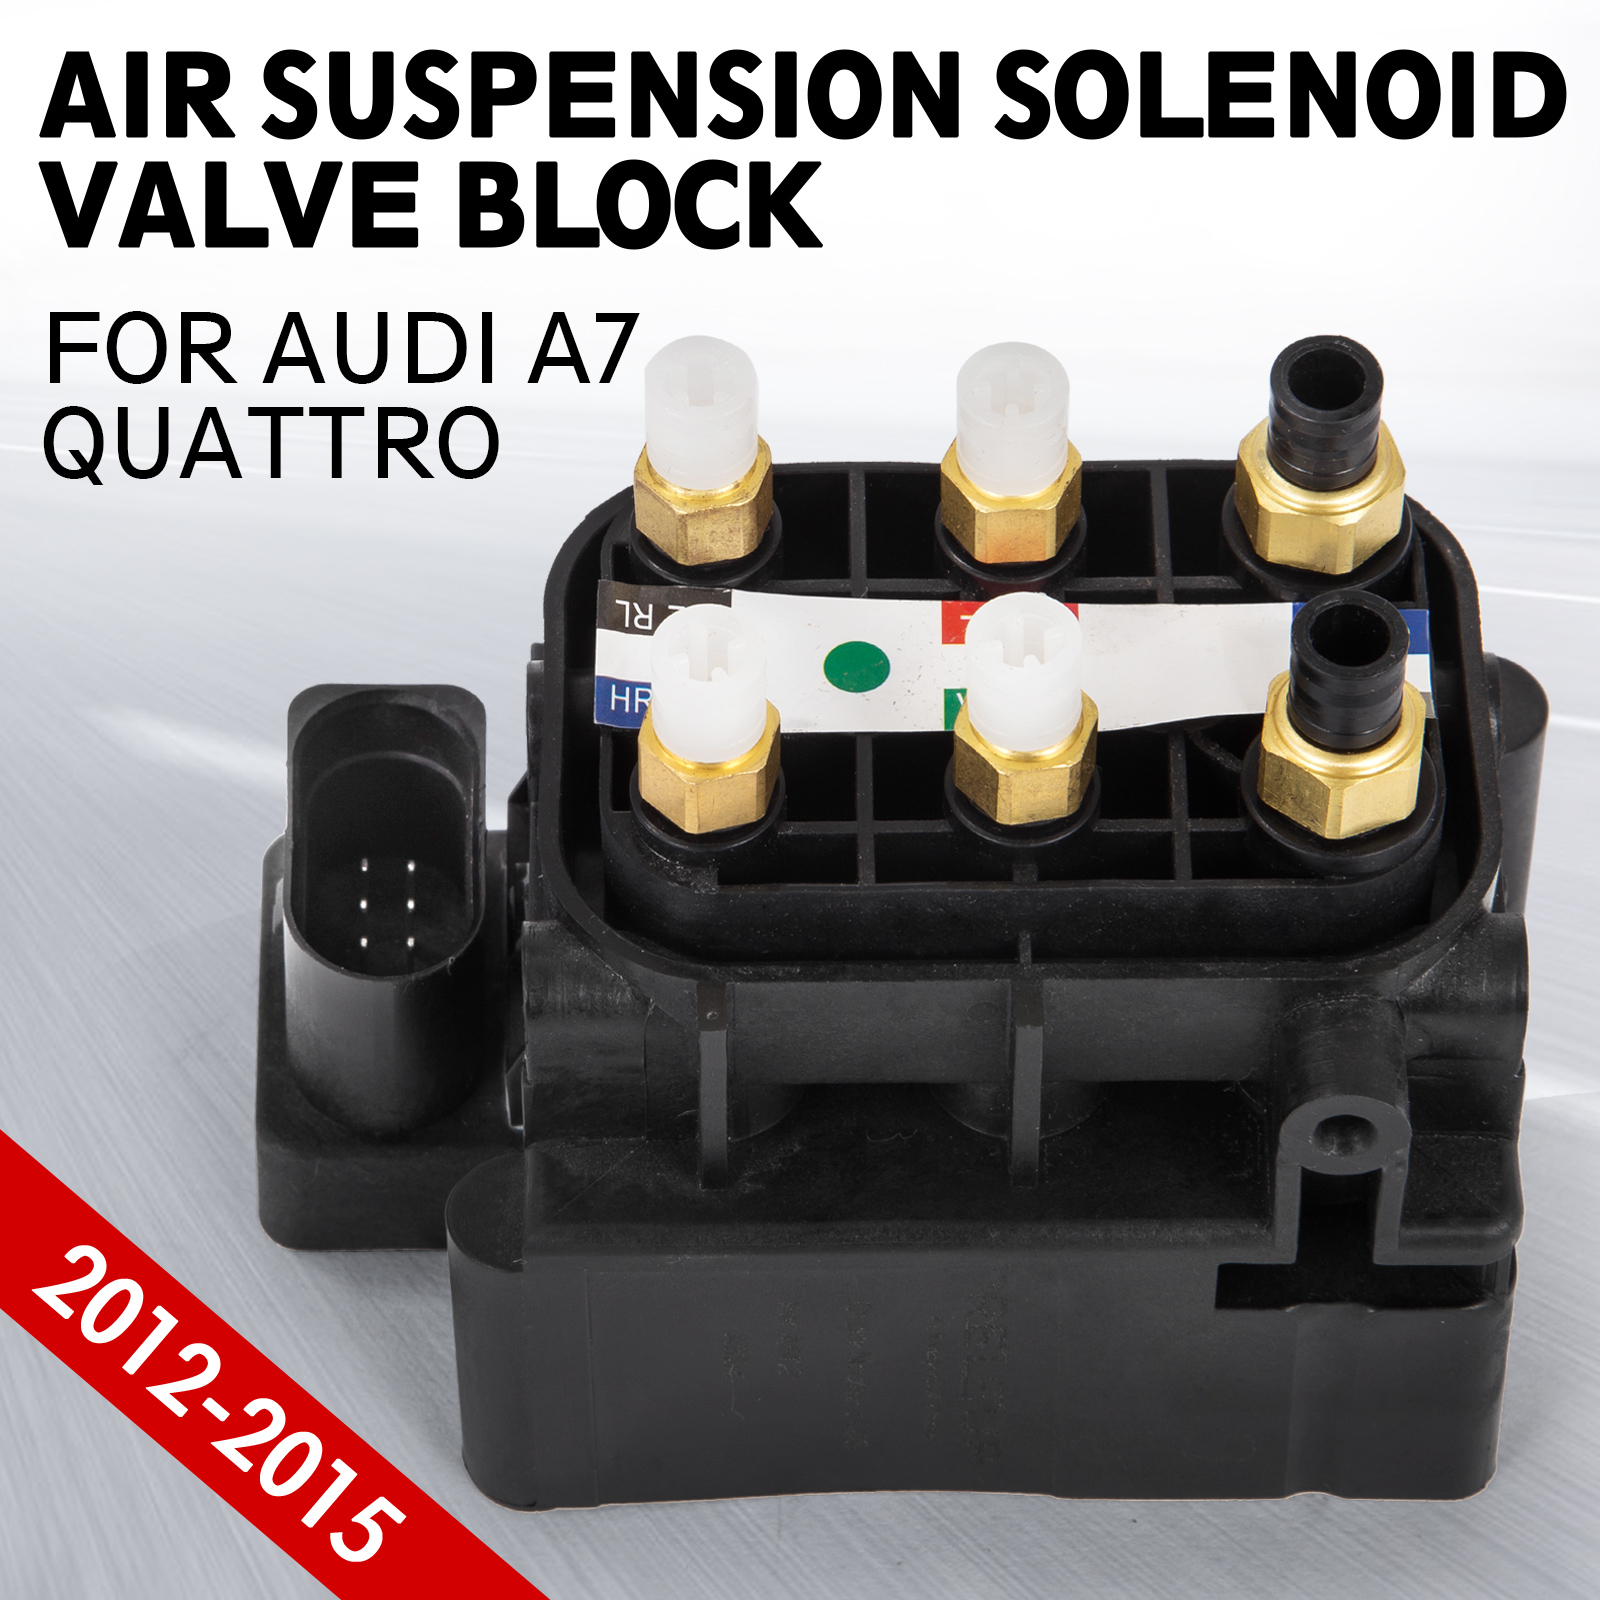 er Air Suspension Valve Control Unit For Audi A7 Quattro 12-15 4H0616013A Hi